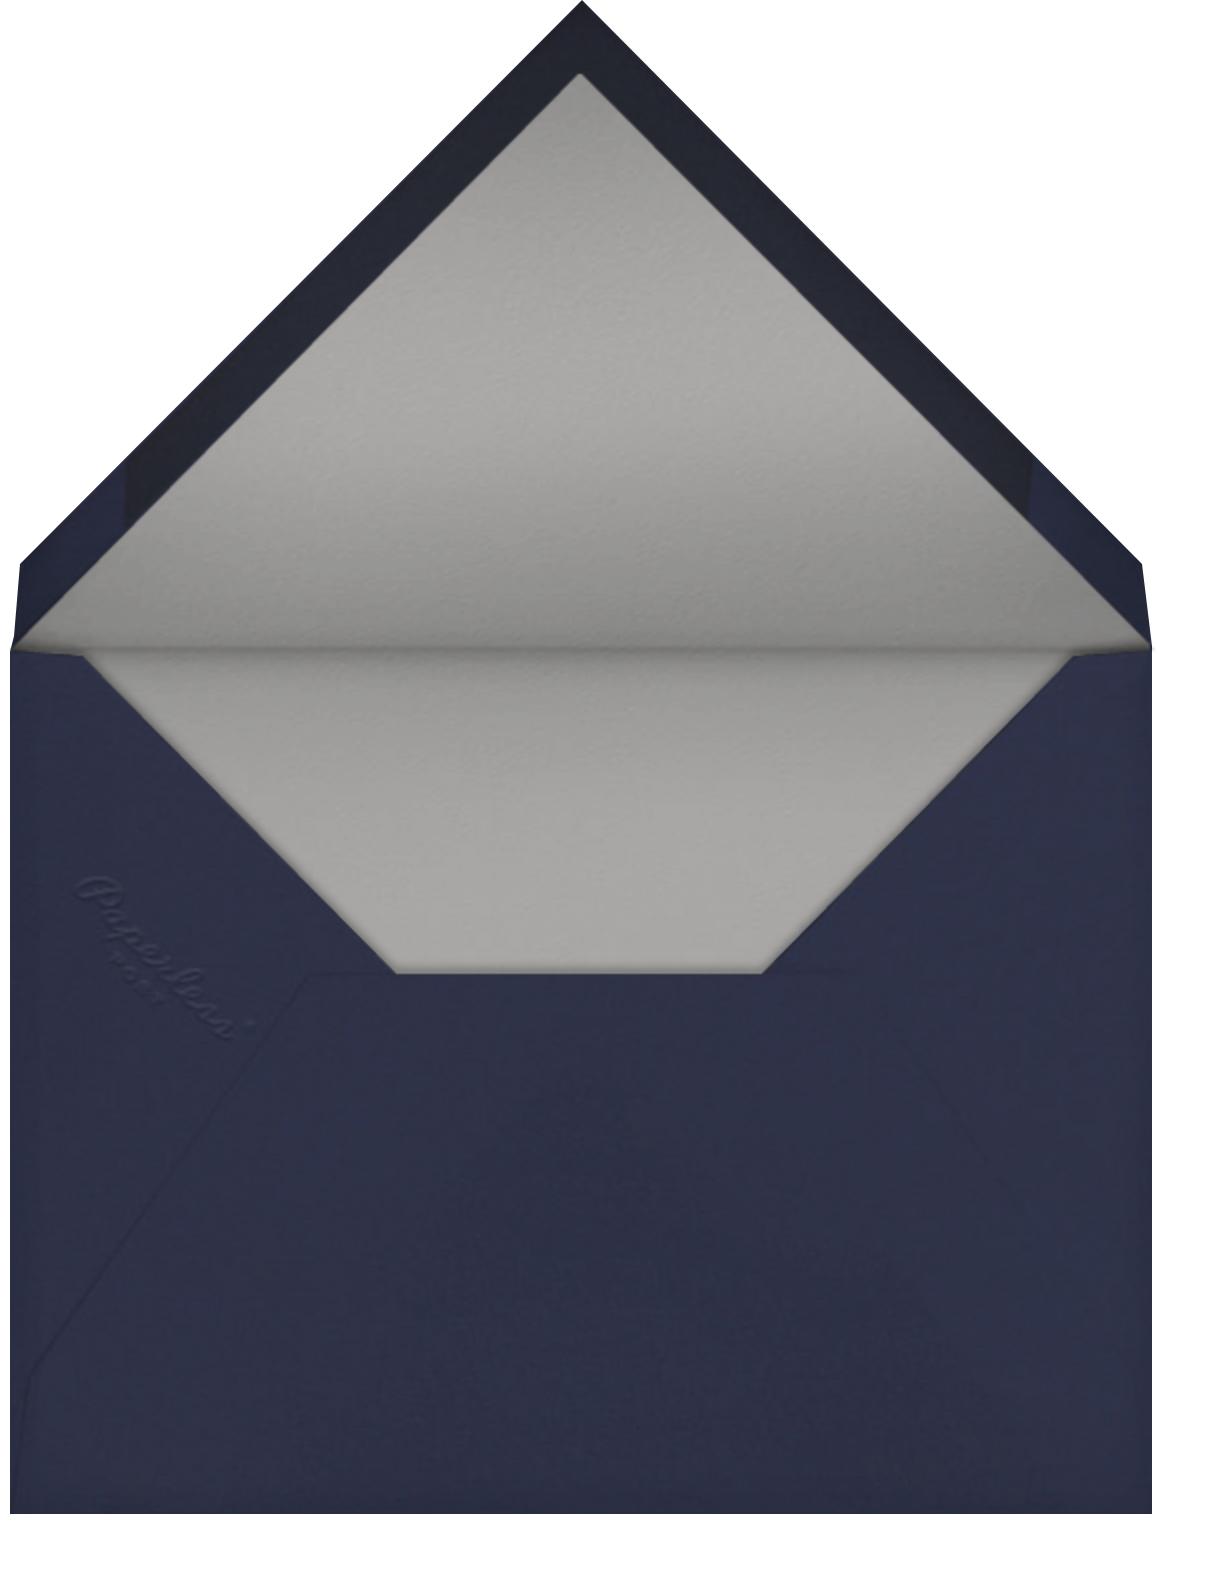 Orbit - Paperless Post - Eventbrite - envelope back